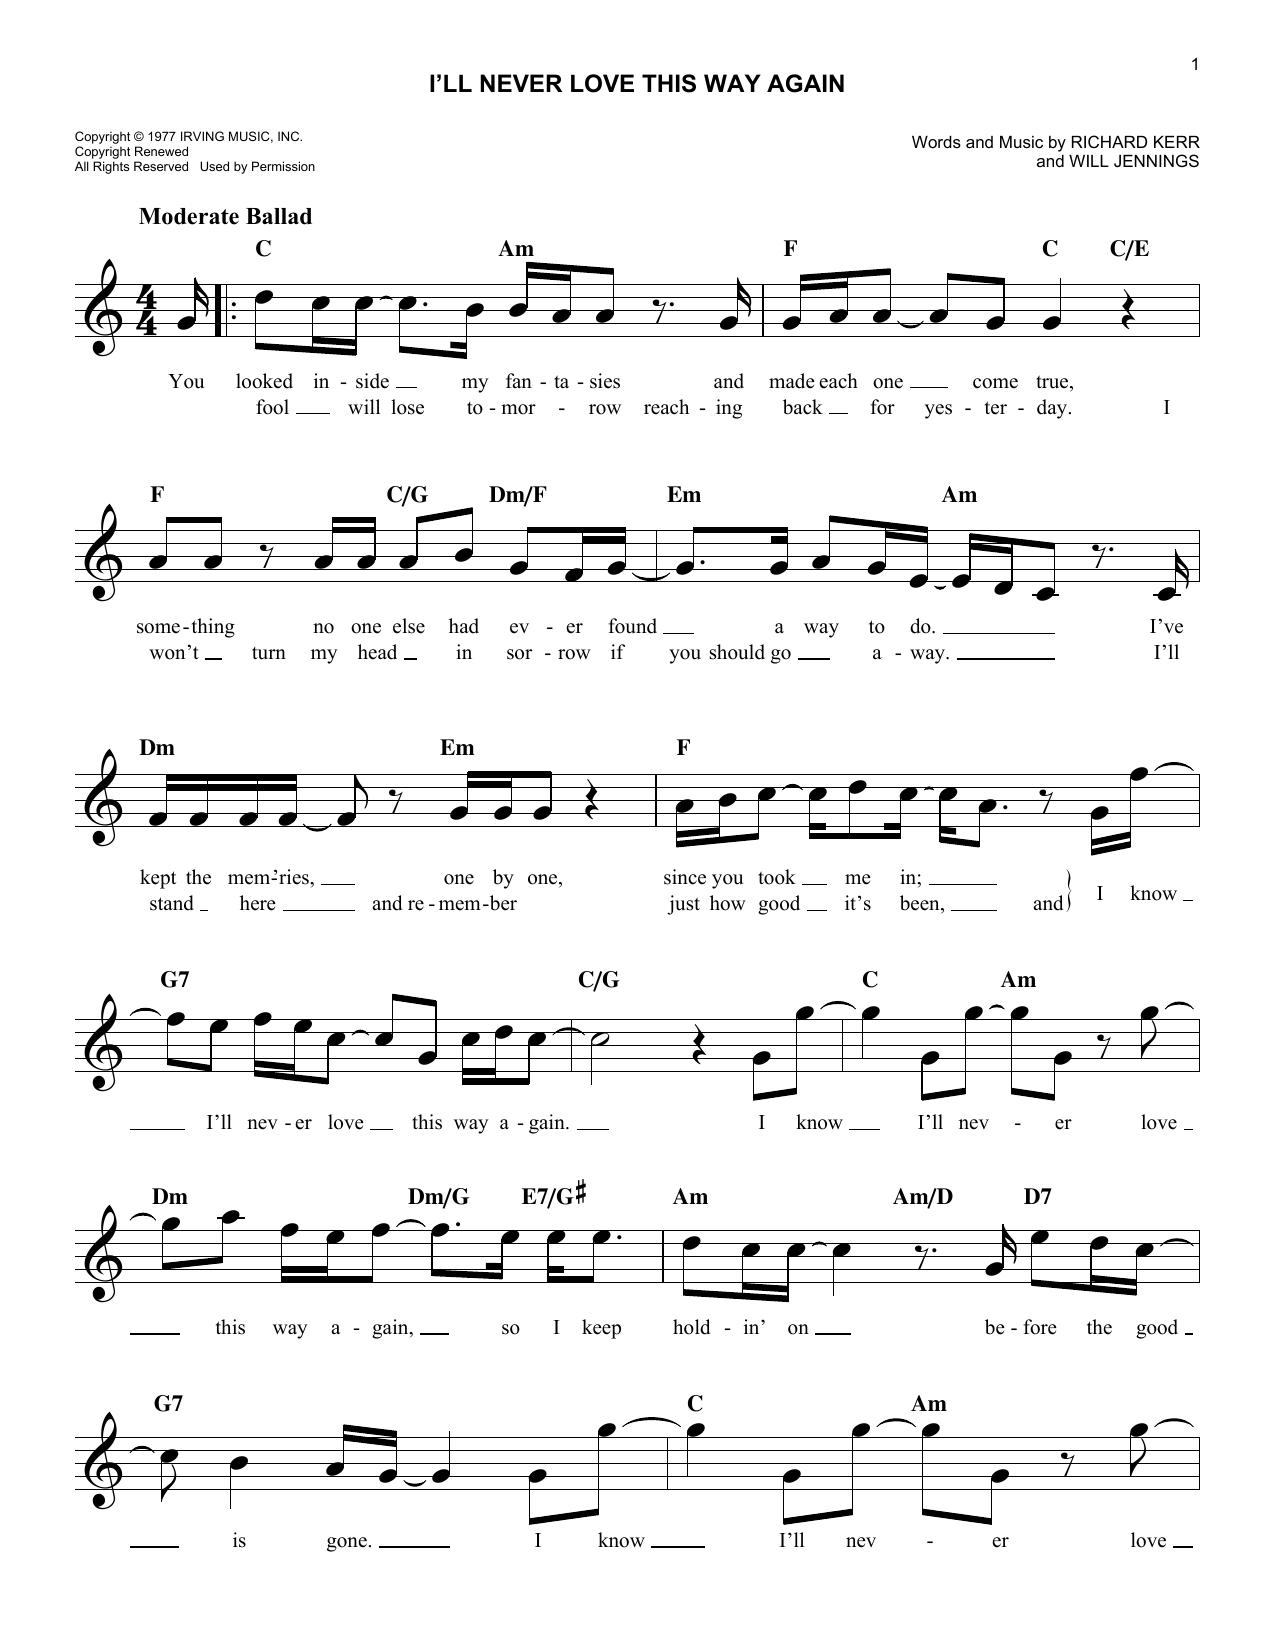 I'll Never Love This Way Again Sheet Music